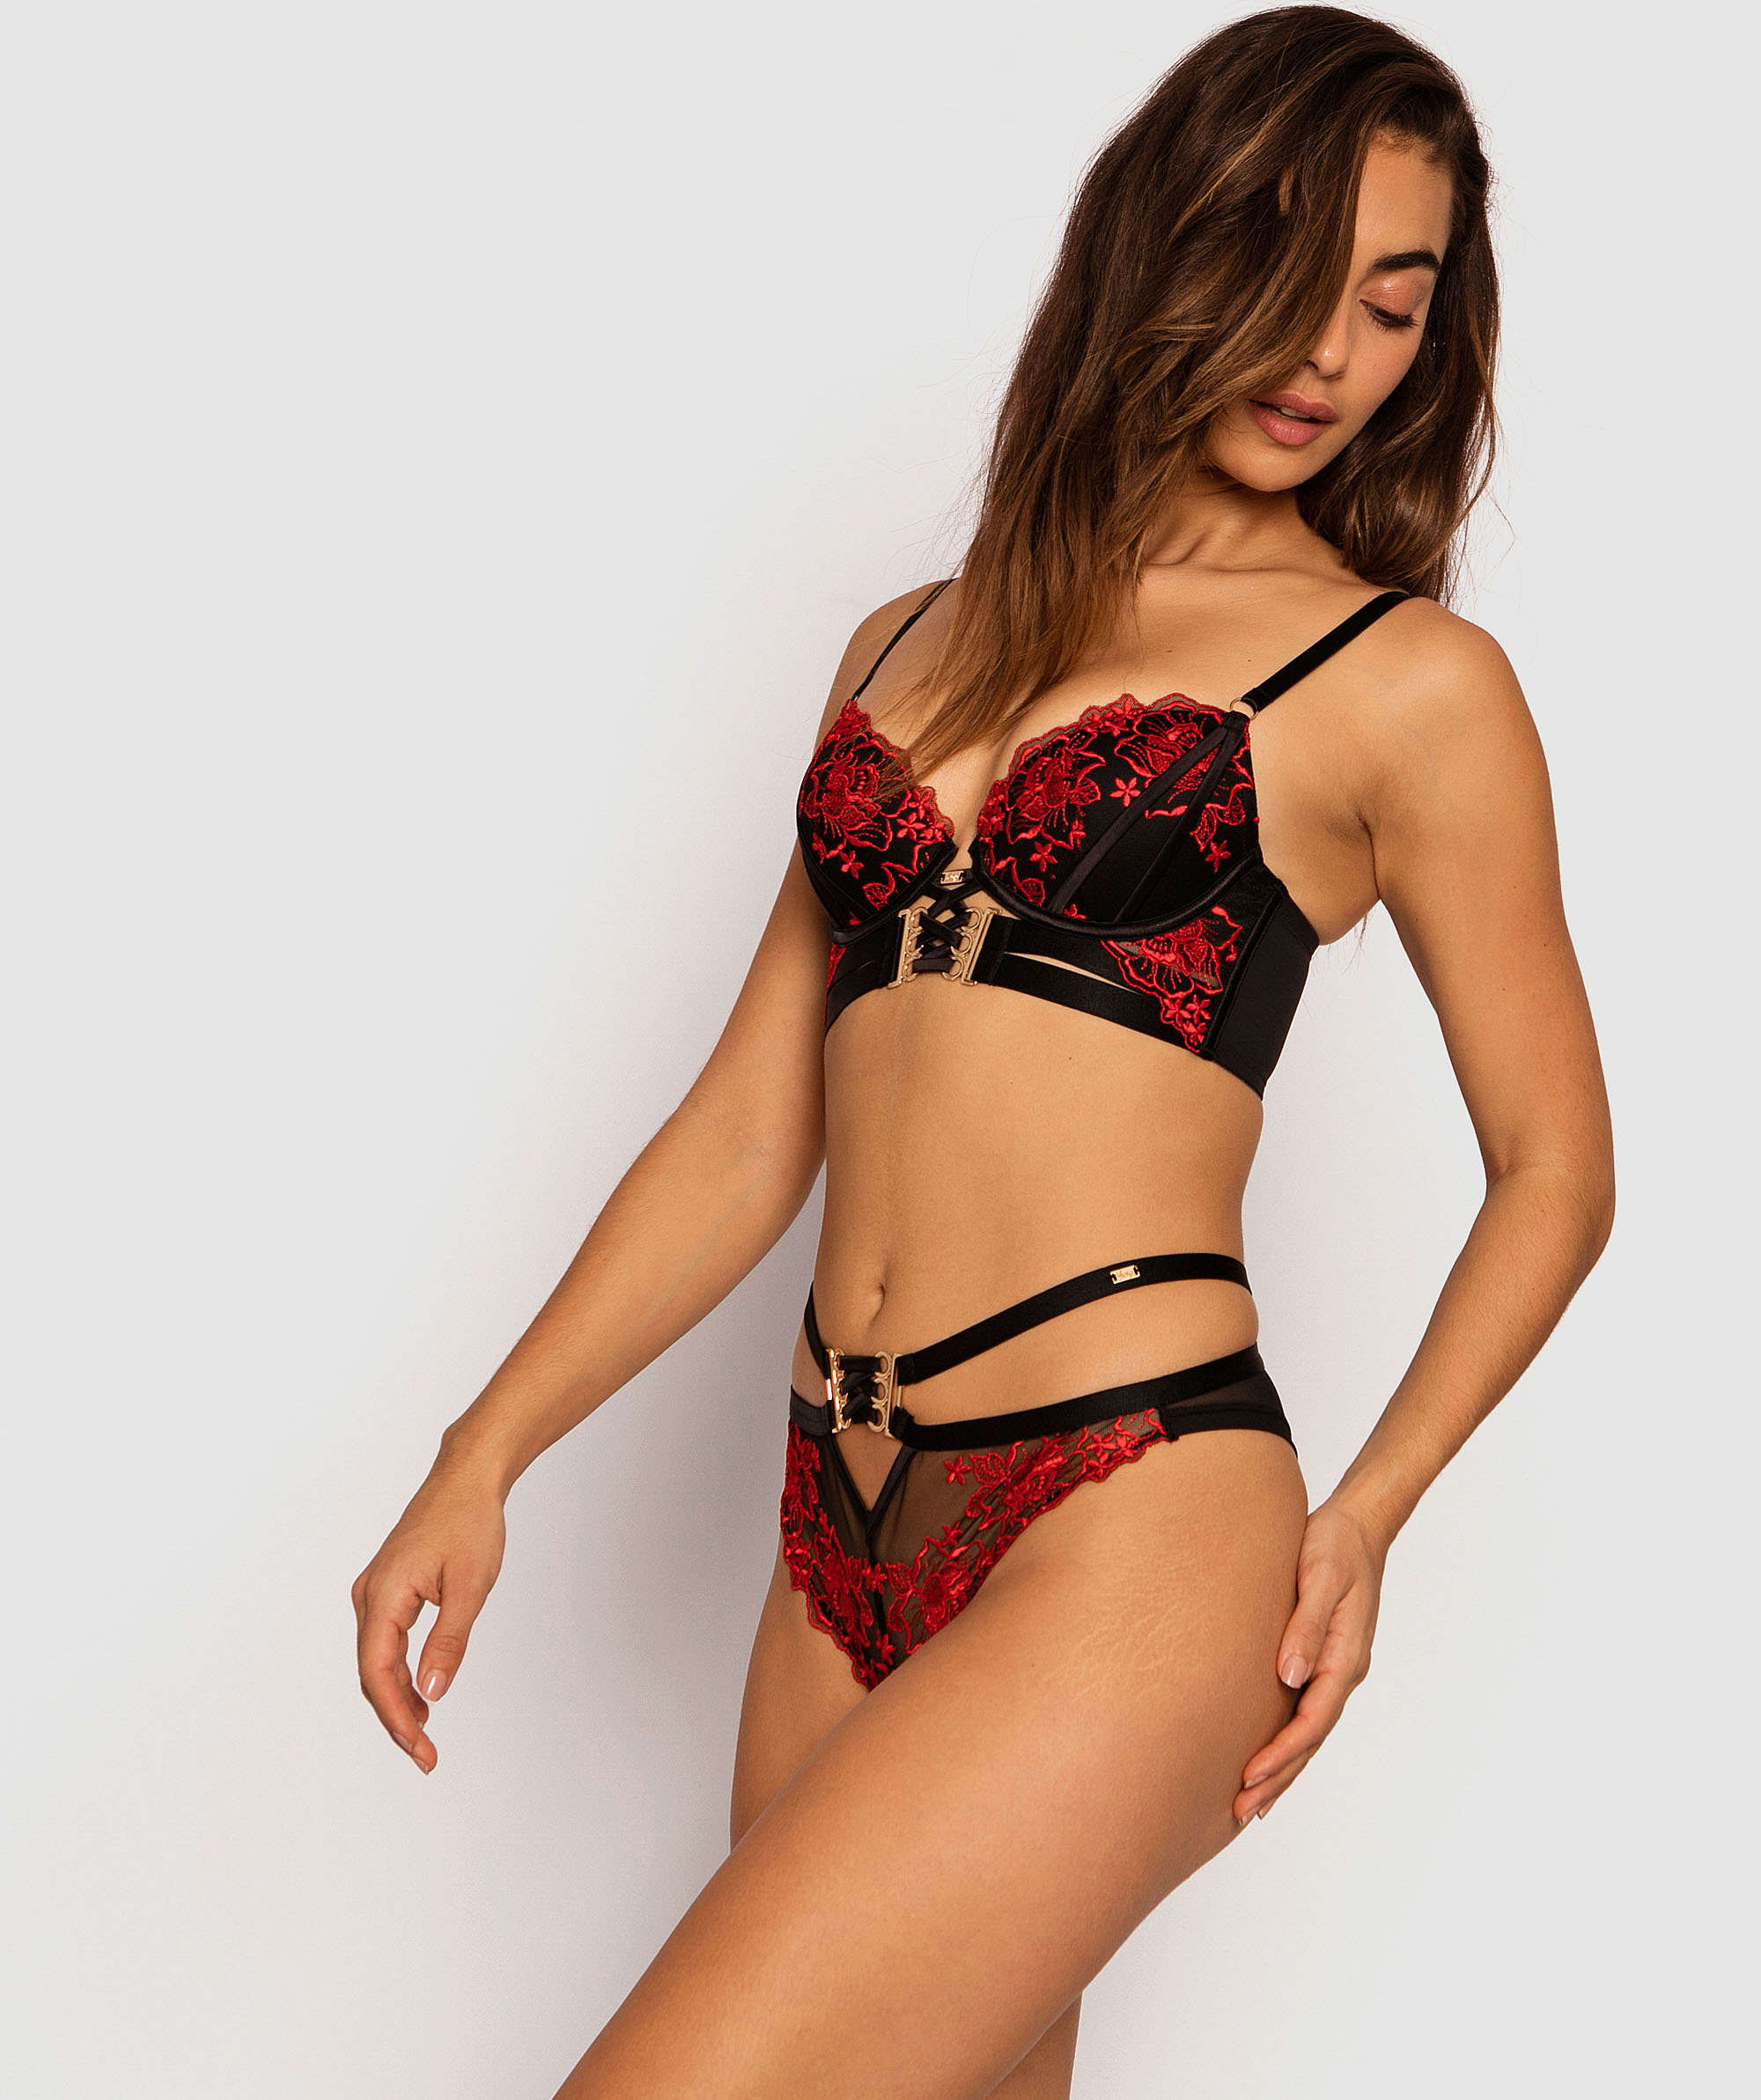 Vamp Eloise Brazilian Knicker - Black/Red